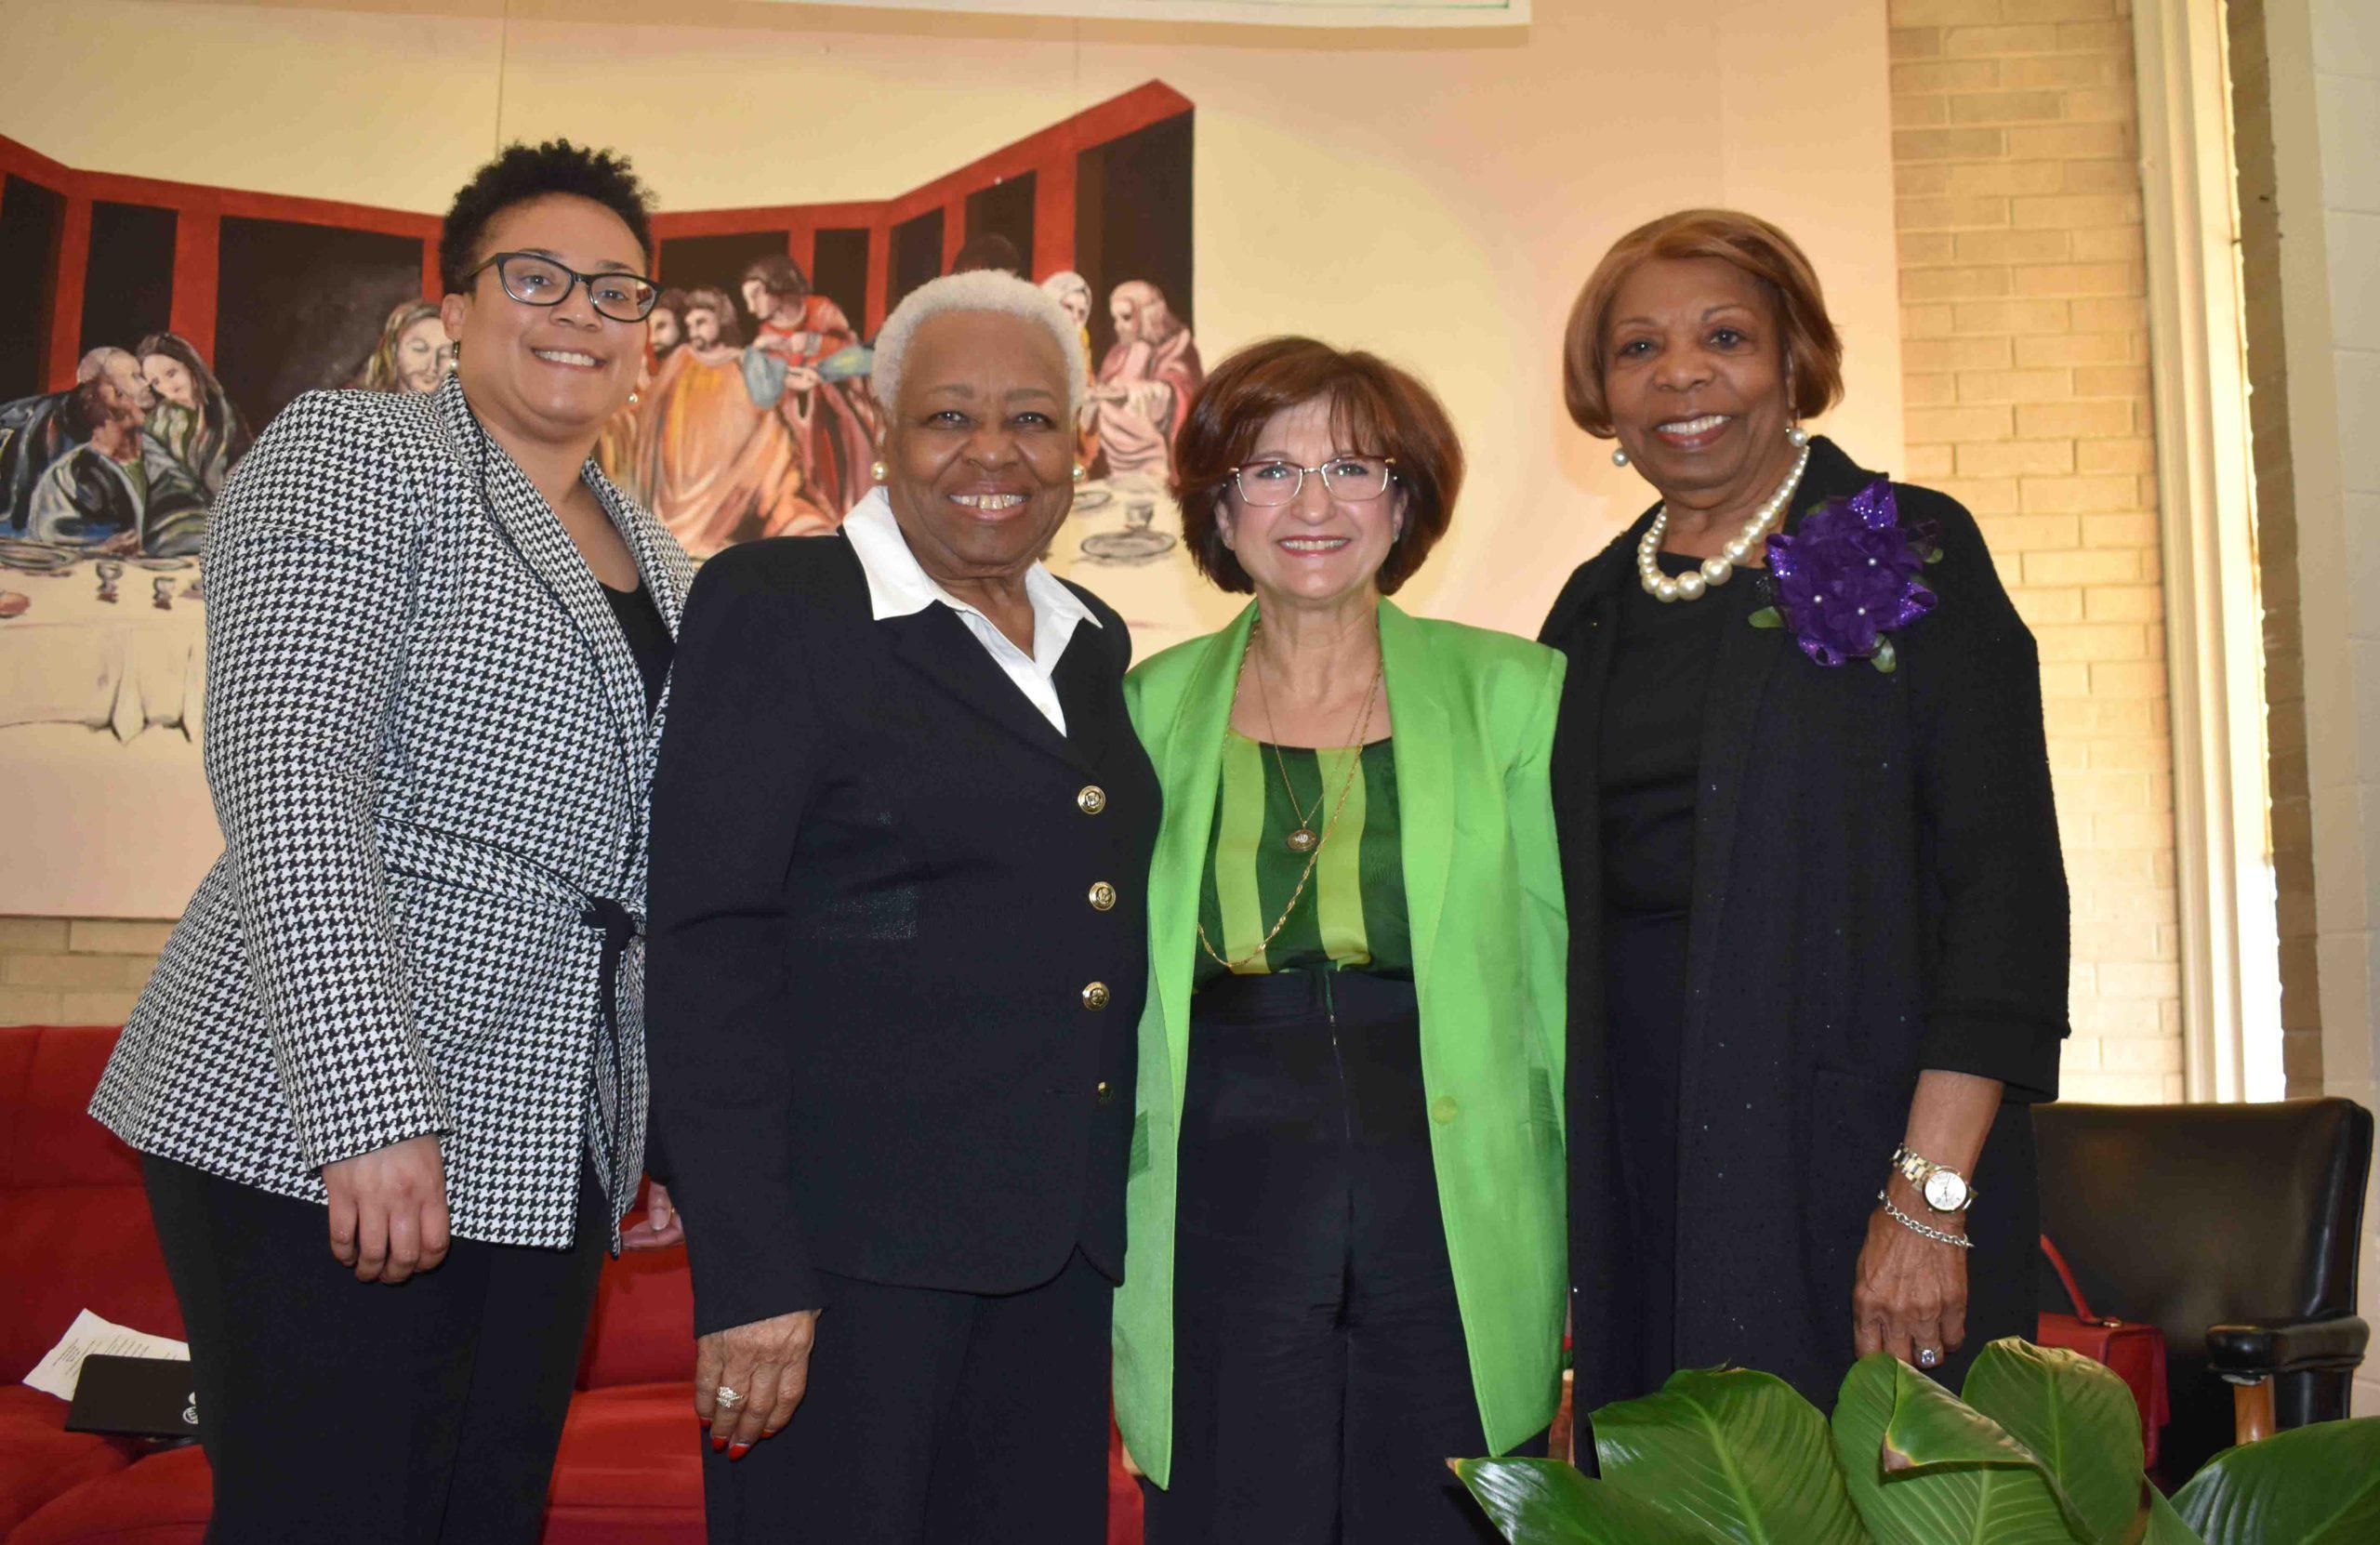 Tanisha Joe Conway (Arkansas PBS' first Black producer), Hon. Irma Hunter Brown (1st black female elected to the AR House of Representatives and the Arkansas Senate), Jamileh Kamran (1st female to own a fashion school), Hon. Lottie Shackleford (1st female Mayor of Little Rock)